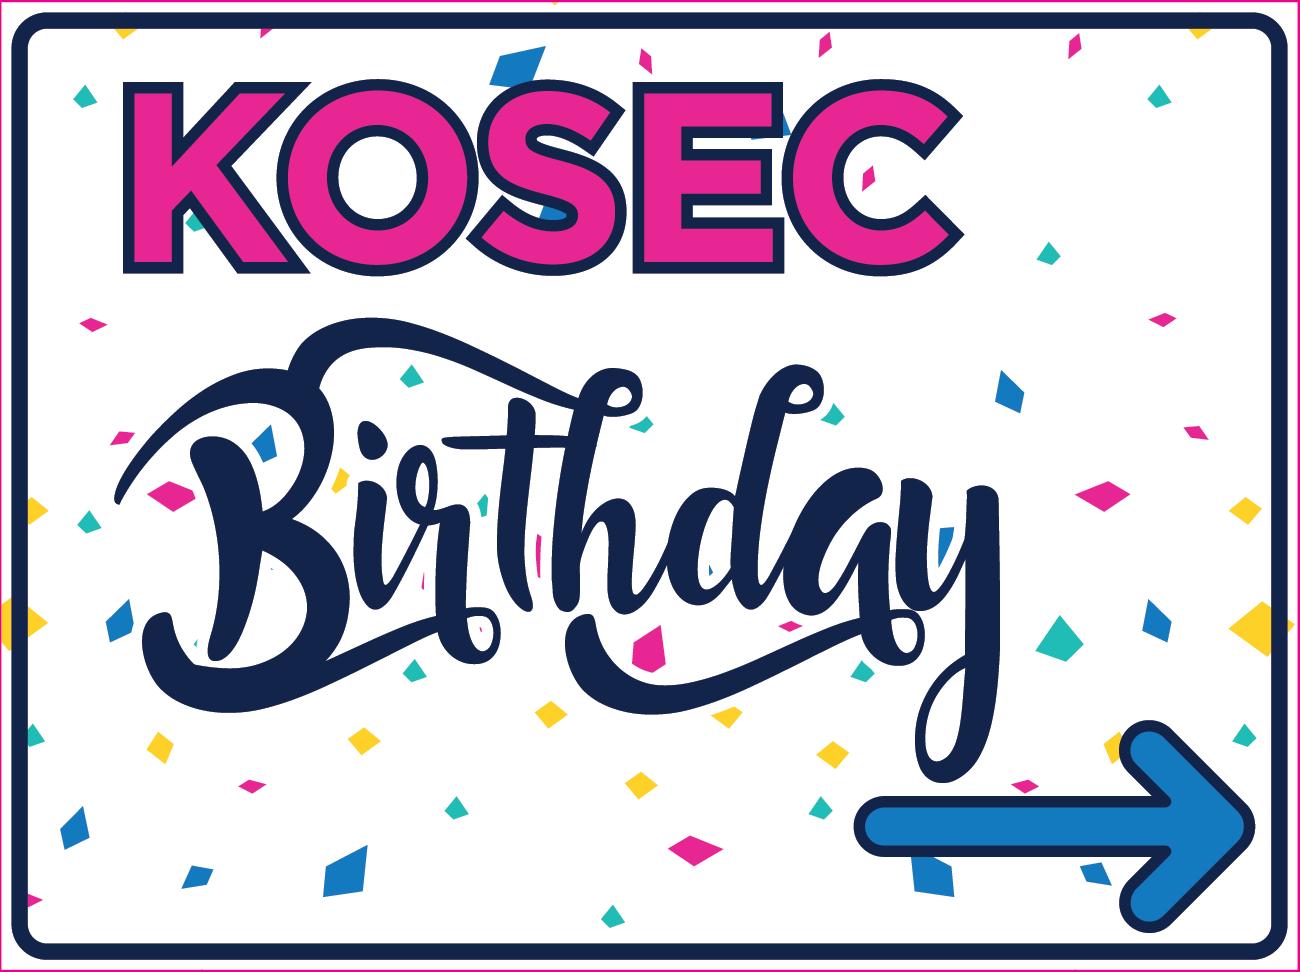 Kosec Family 38x96_18x24 90TH BIRTHDAY Proof 05-07-19-02.png